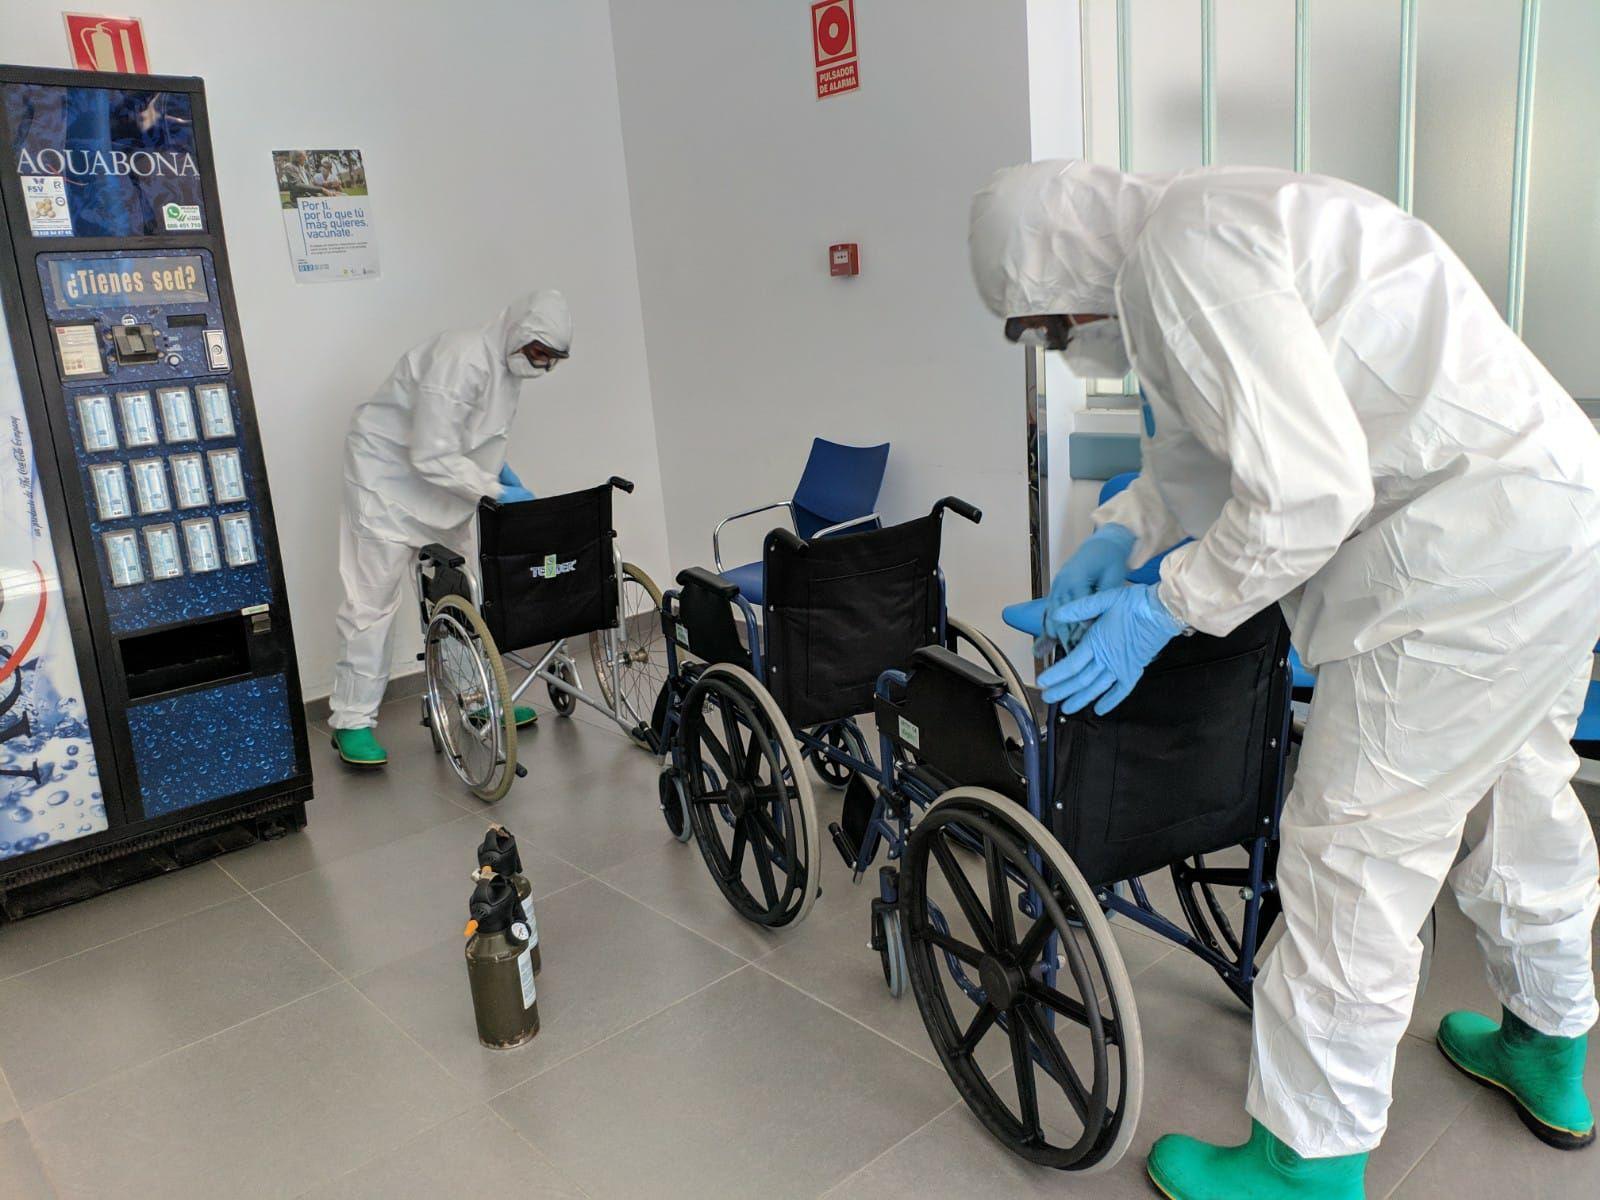 Rastreadores militares de Canarias, cuatro meses de lucha contra la pandemia